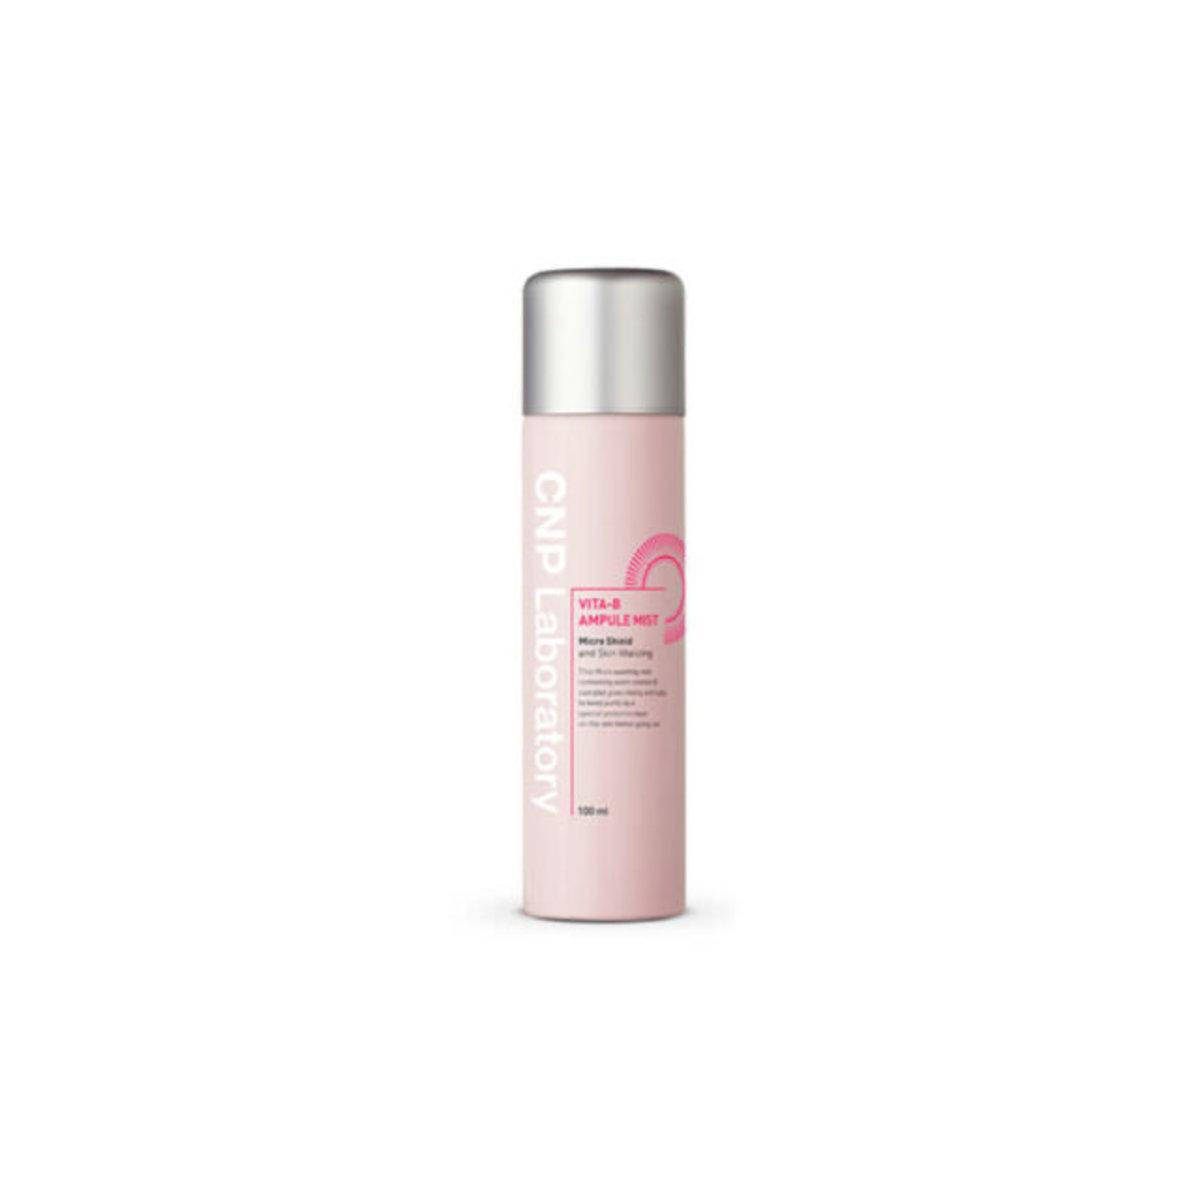 Vita-B Ampule Mist 100ml -[Parallel Import Product]